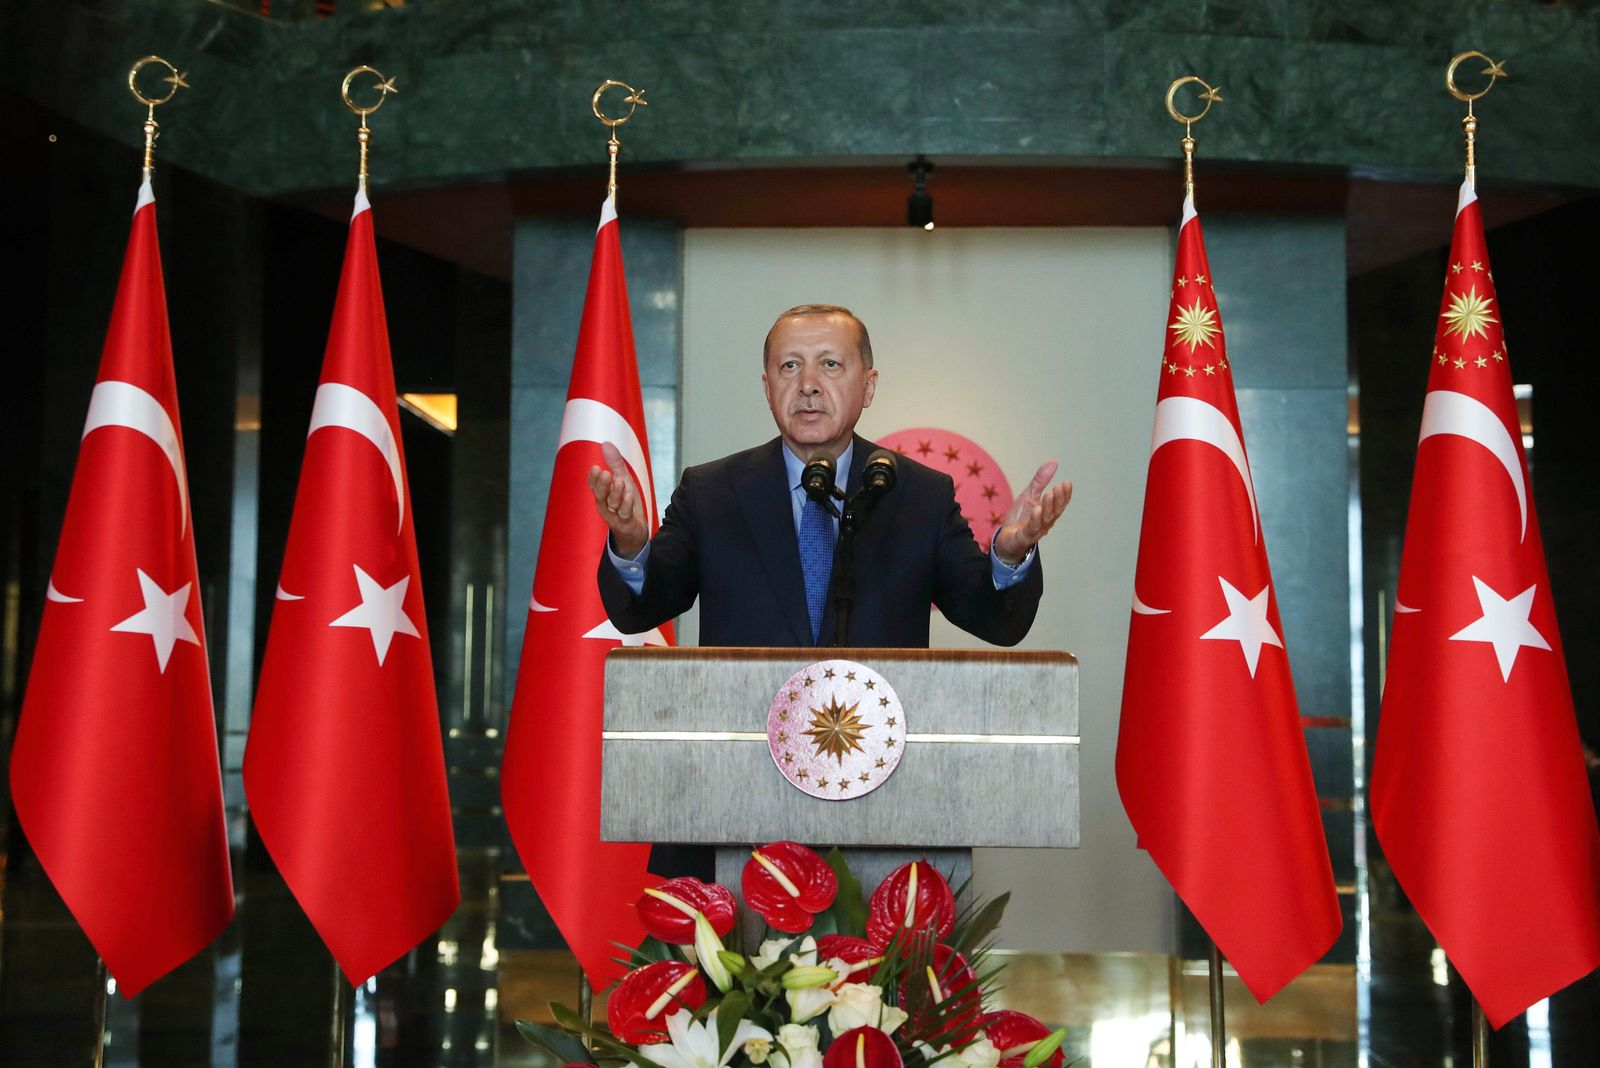 TURKEY-POLITICS-ECONOMY